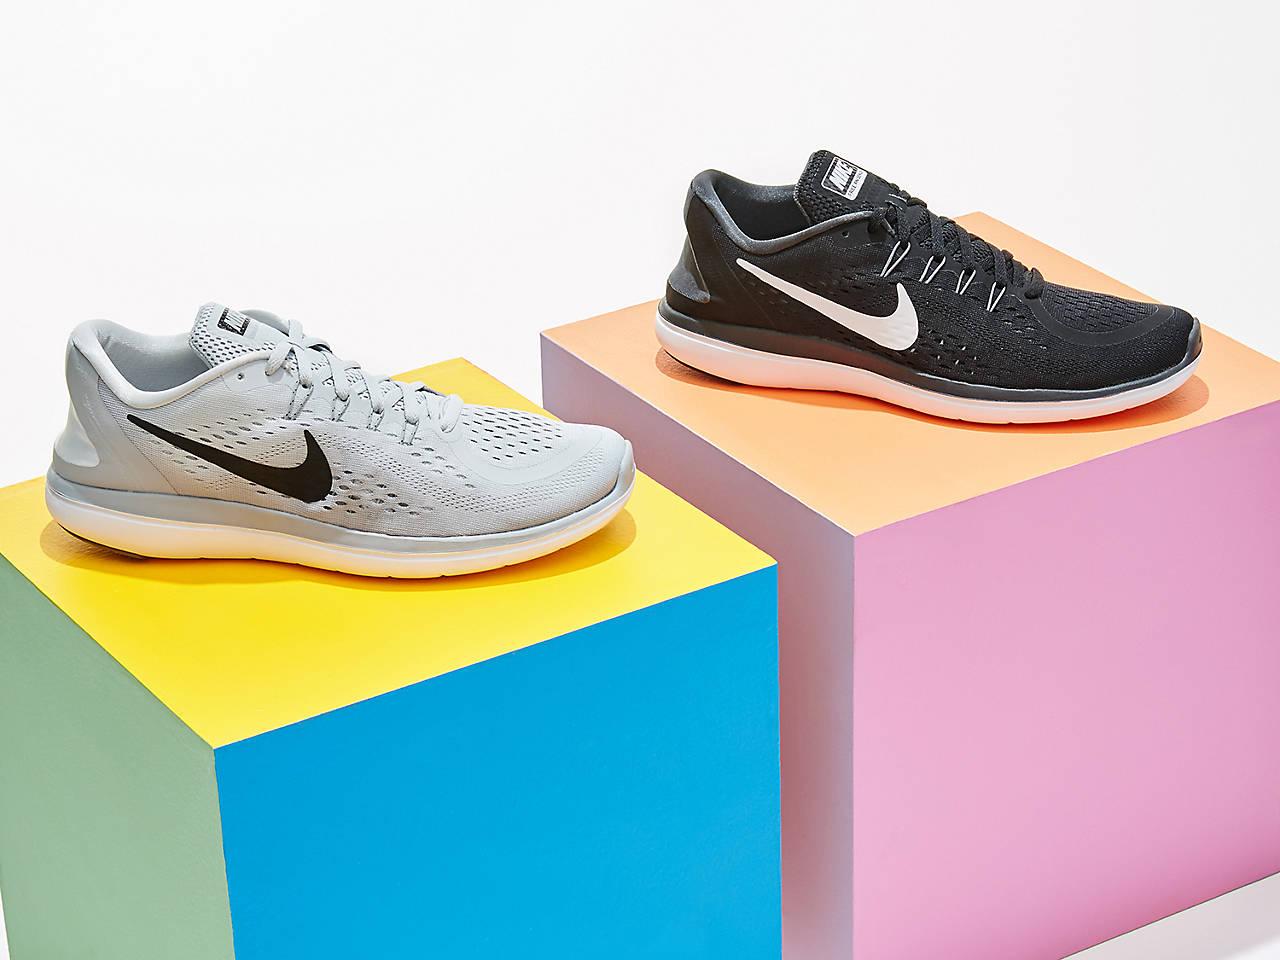 20c0b48e337 Nike Flex 2017 RN Lightweight Running Shoe - Men s Men s Shoes